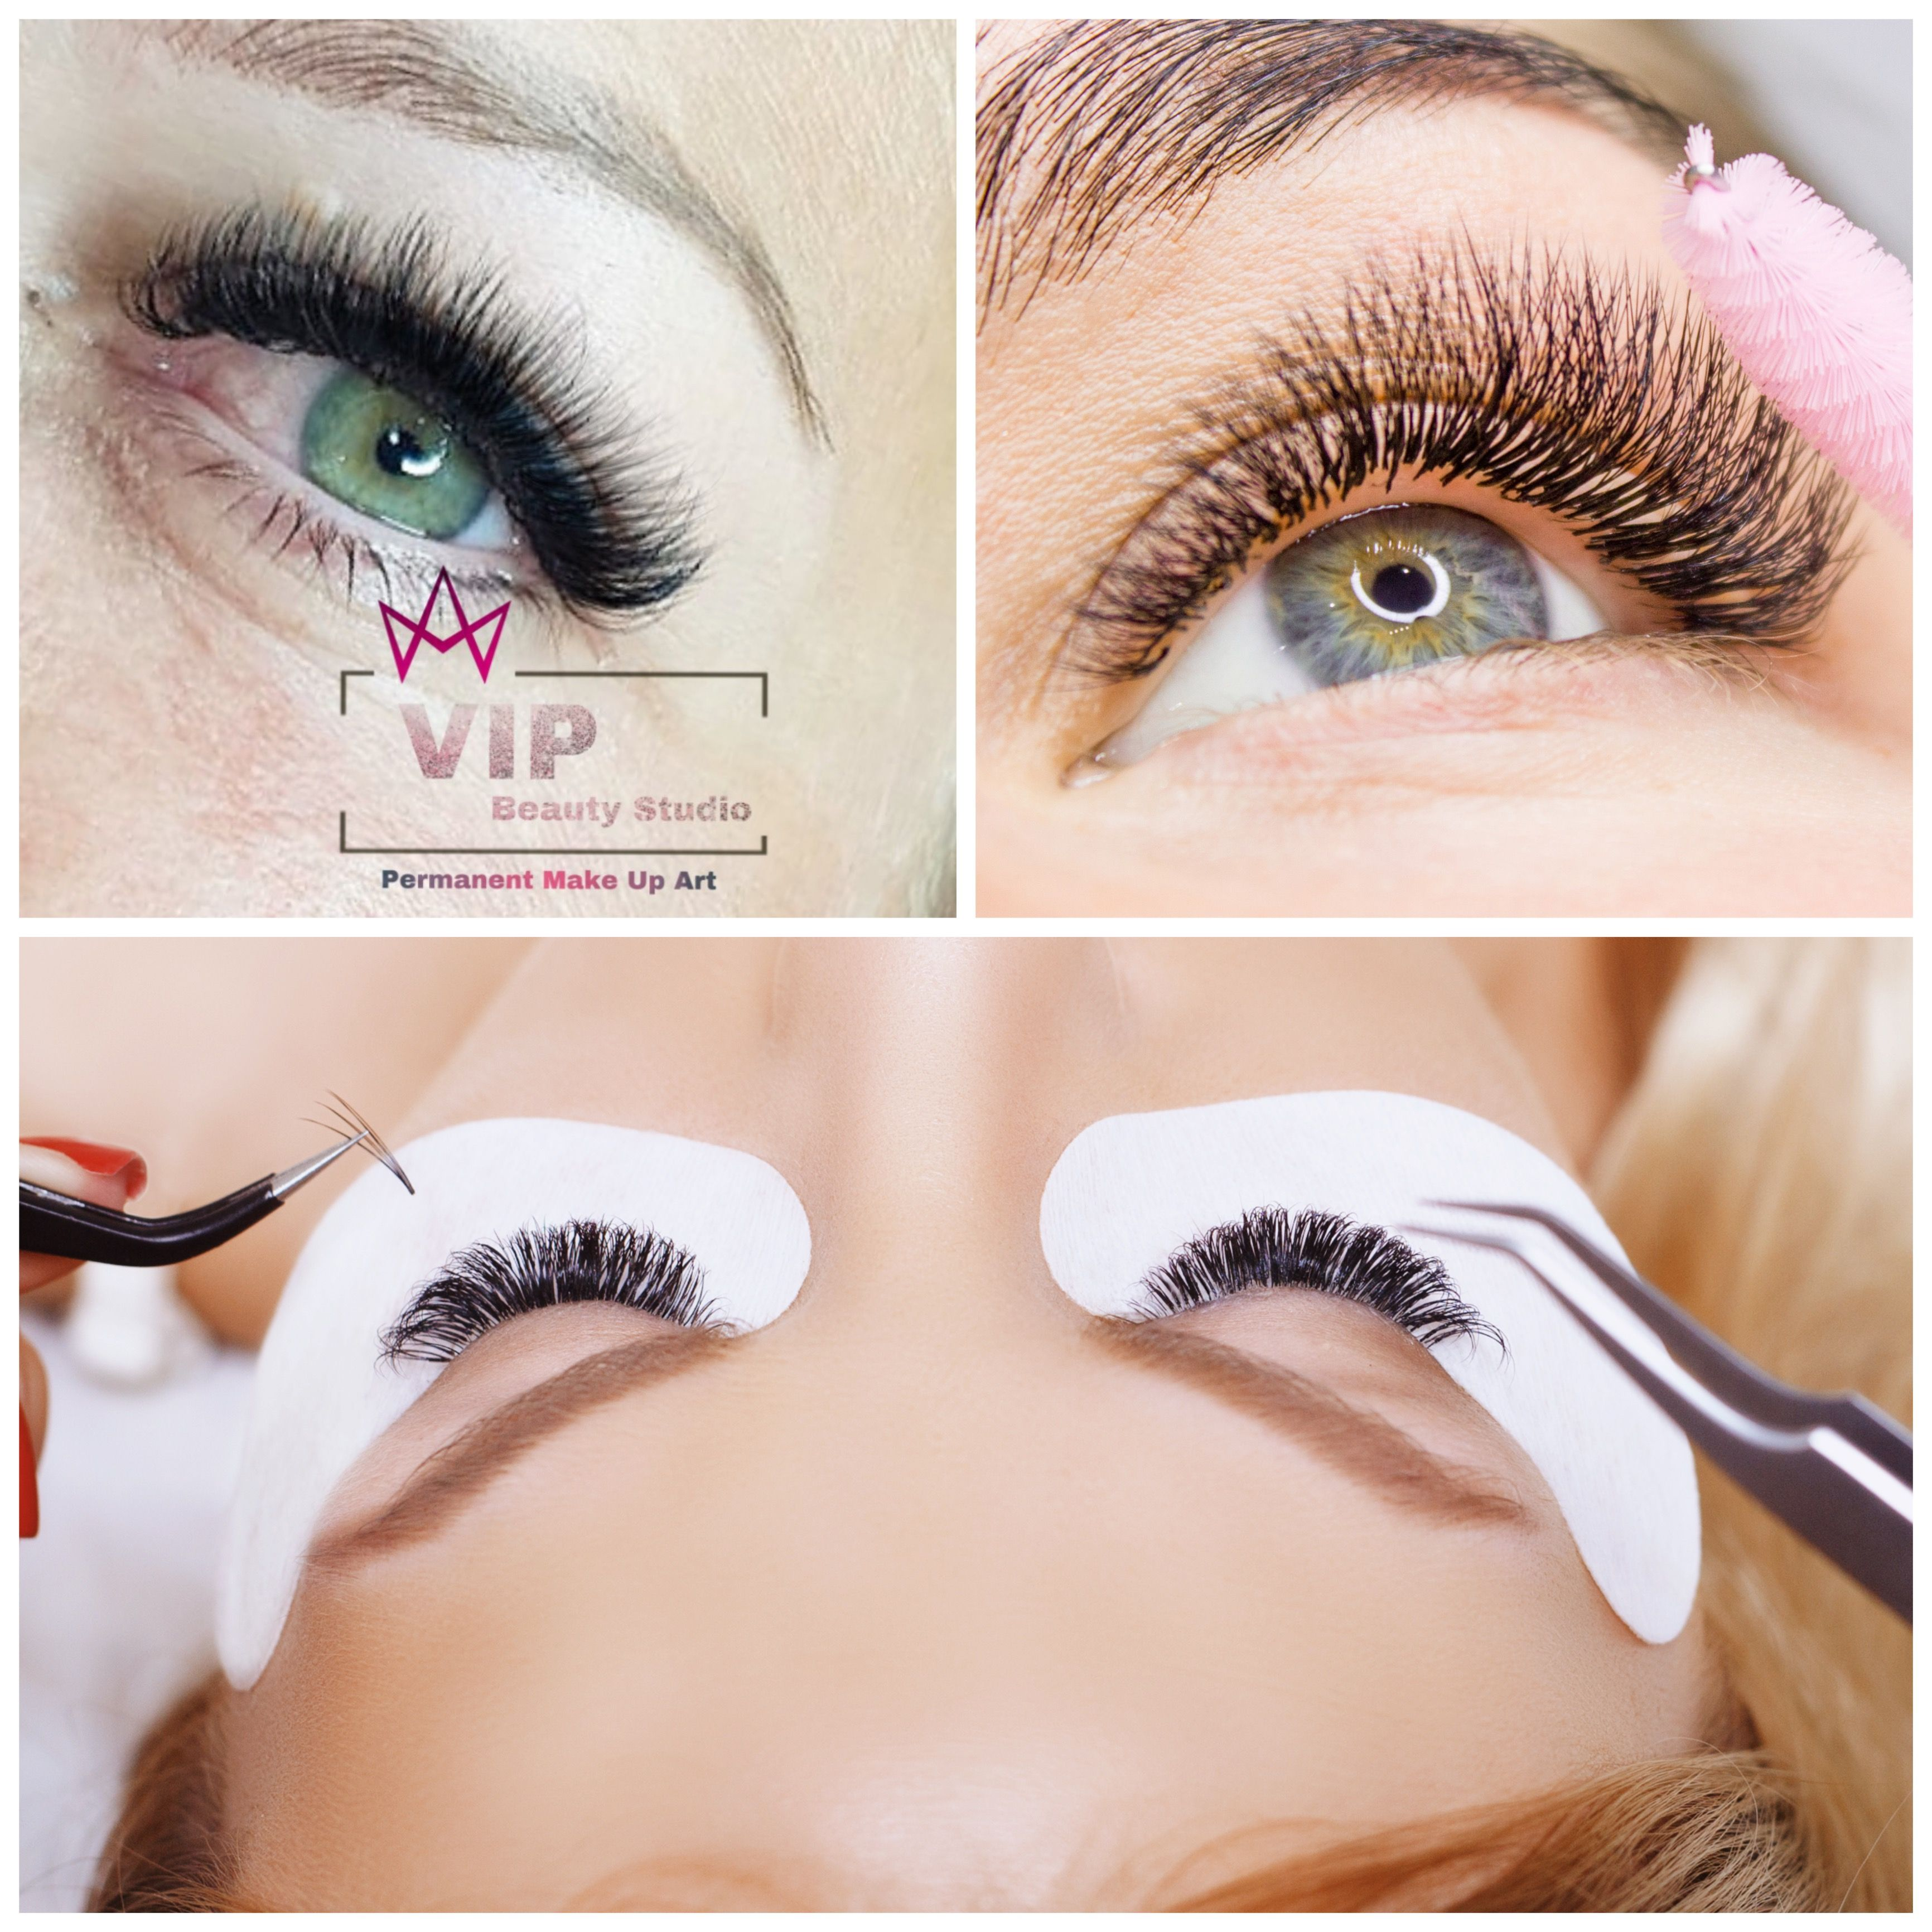 Vip Beauty Studio Permanent Make Up Art In Ingolstadt Wimpernverlangerung Wimpern Lidstrich